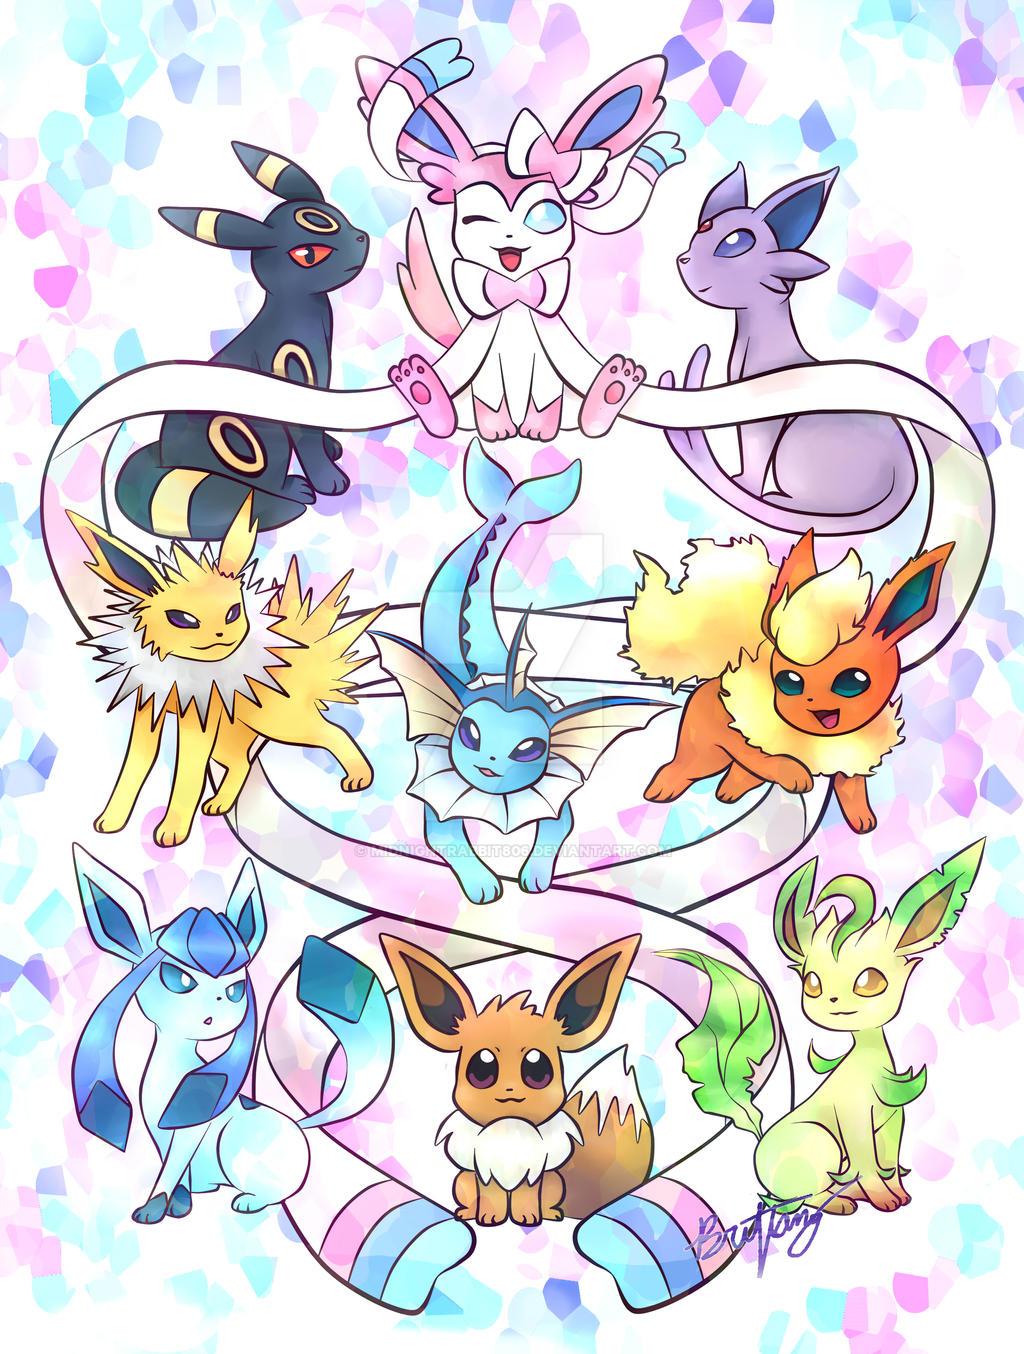 Chibi Pokemon Eevee Evolutions Images | Pokemon Images